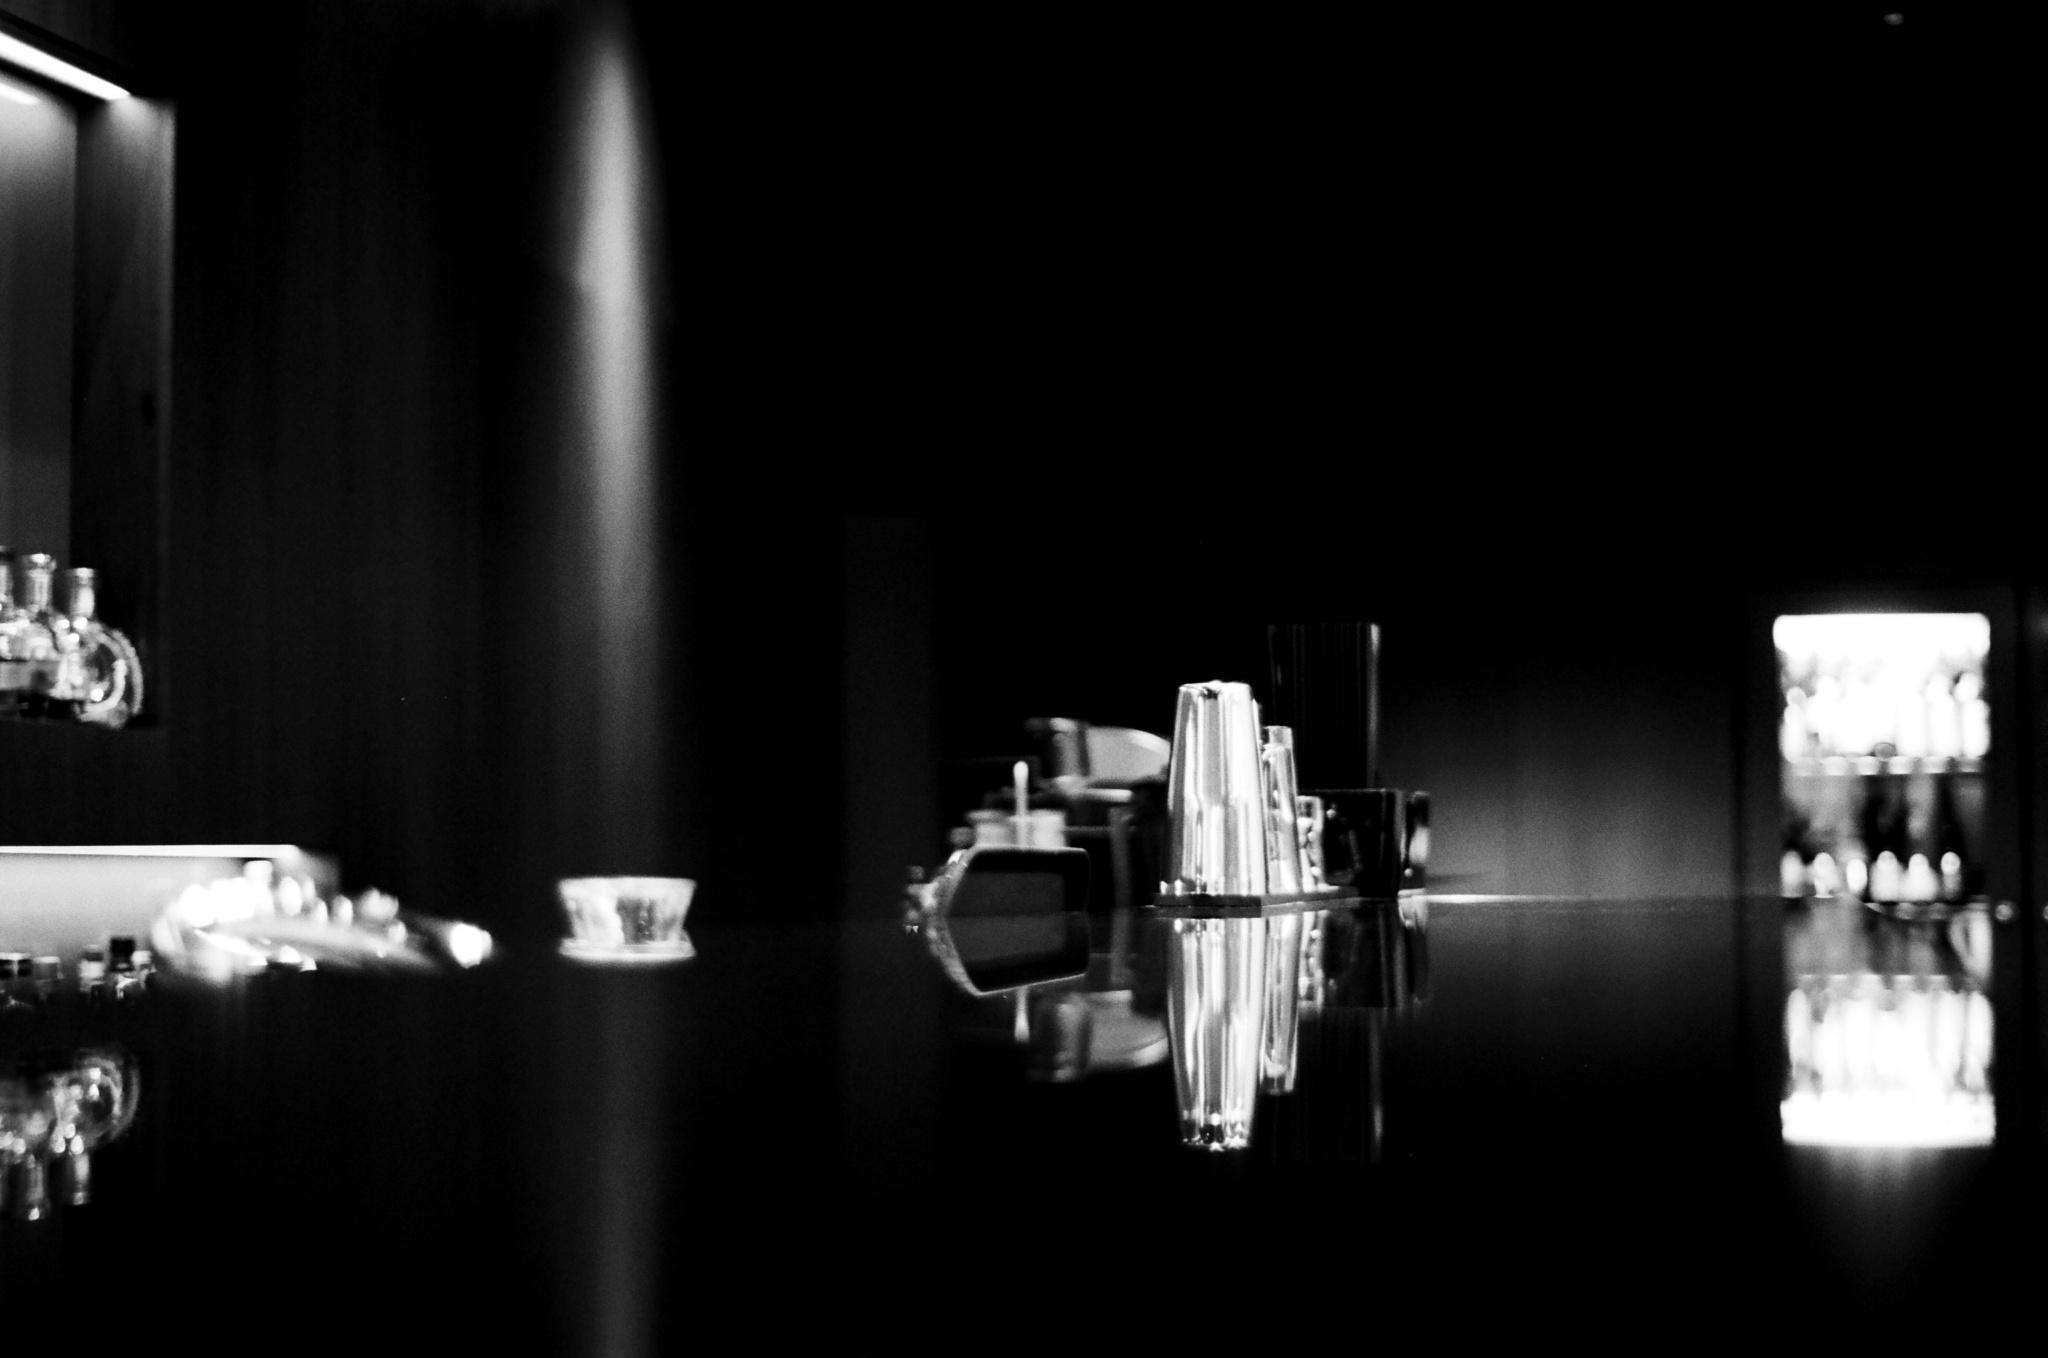 Untitled by Vadim Becker